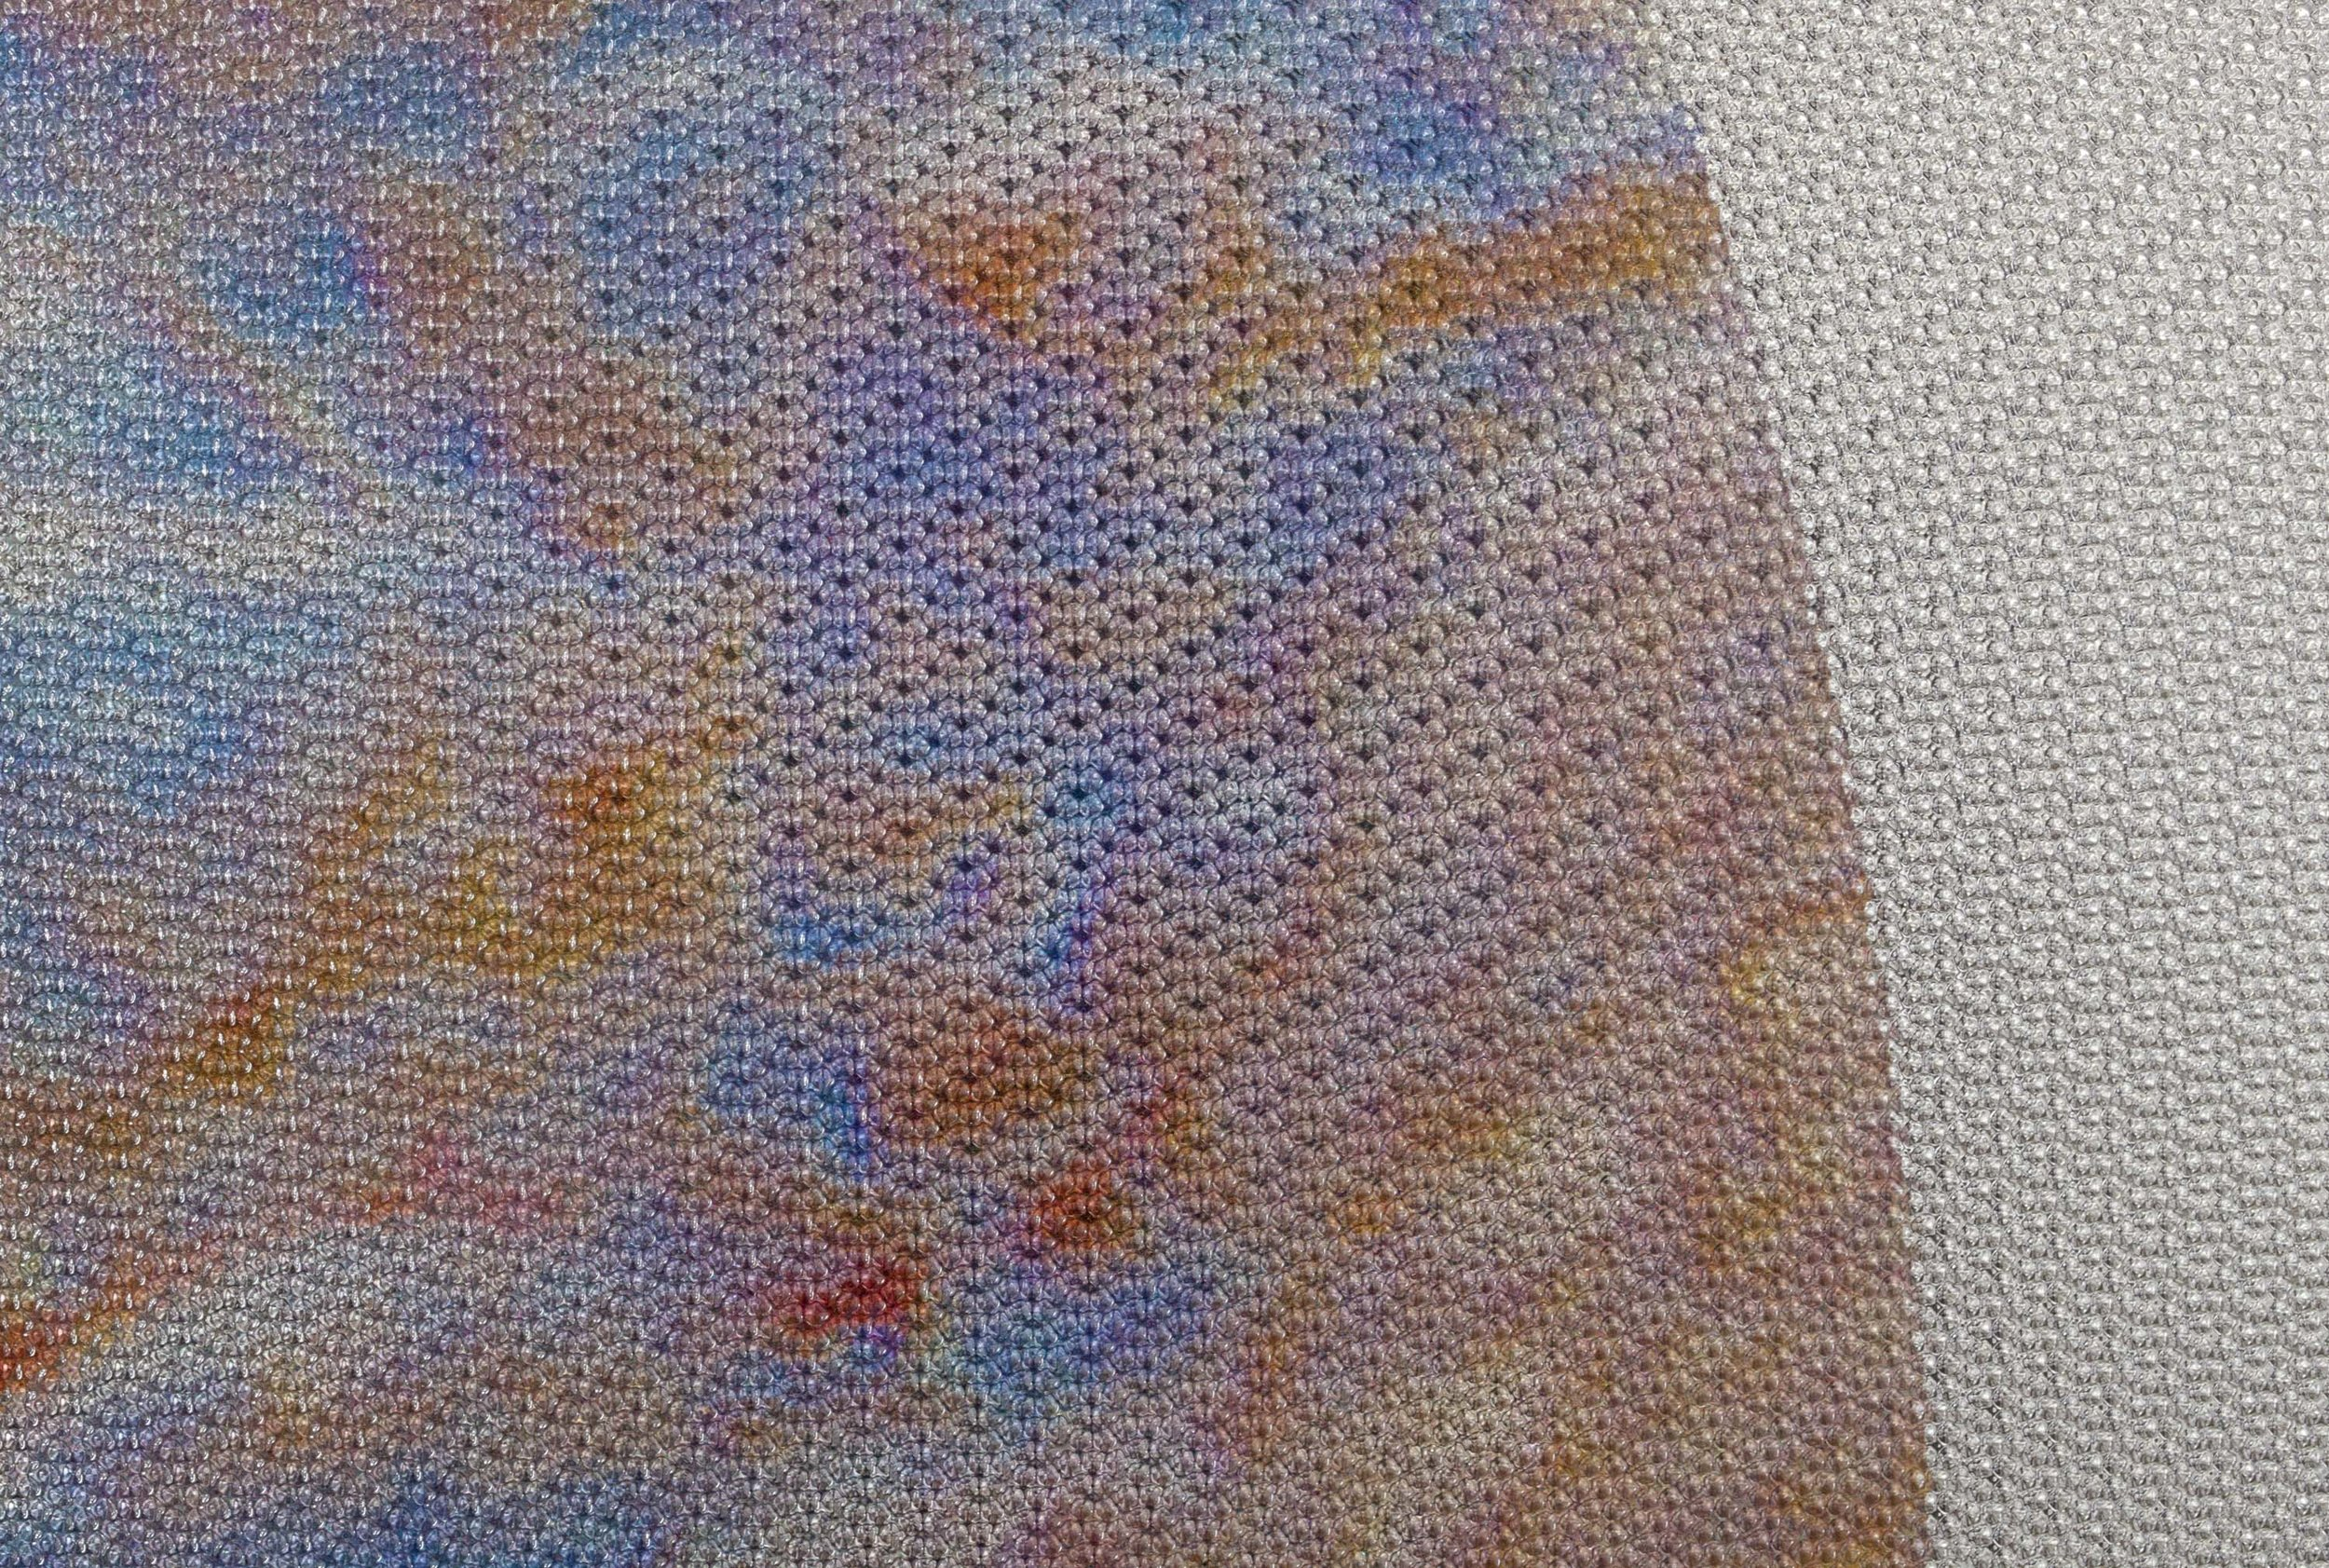 Beyond the Oecumene / Part XXVIII,  2019 - Detail Aquarelle, wax pastels, UV-print on mirror beneath structured Plexiglas